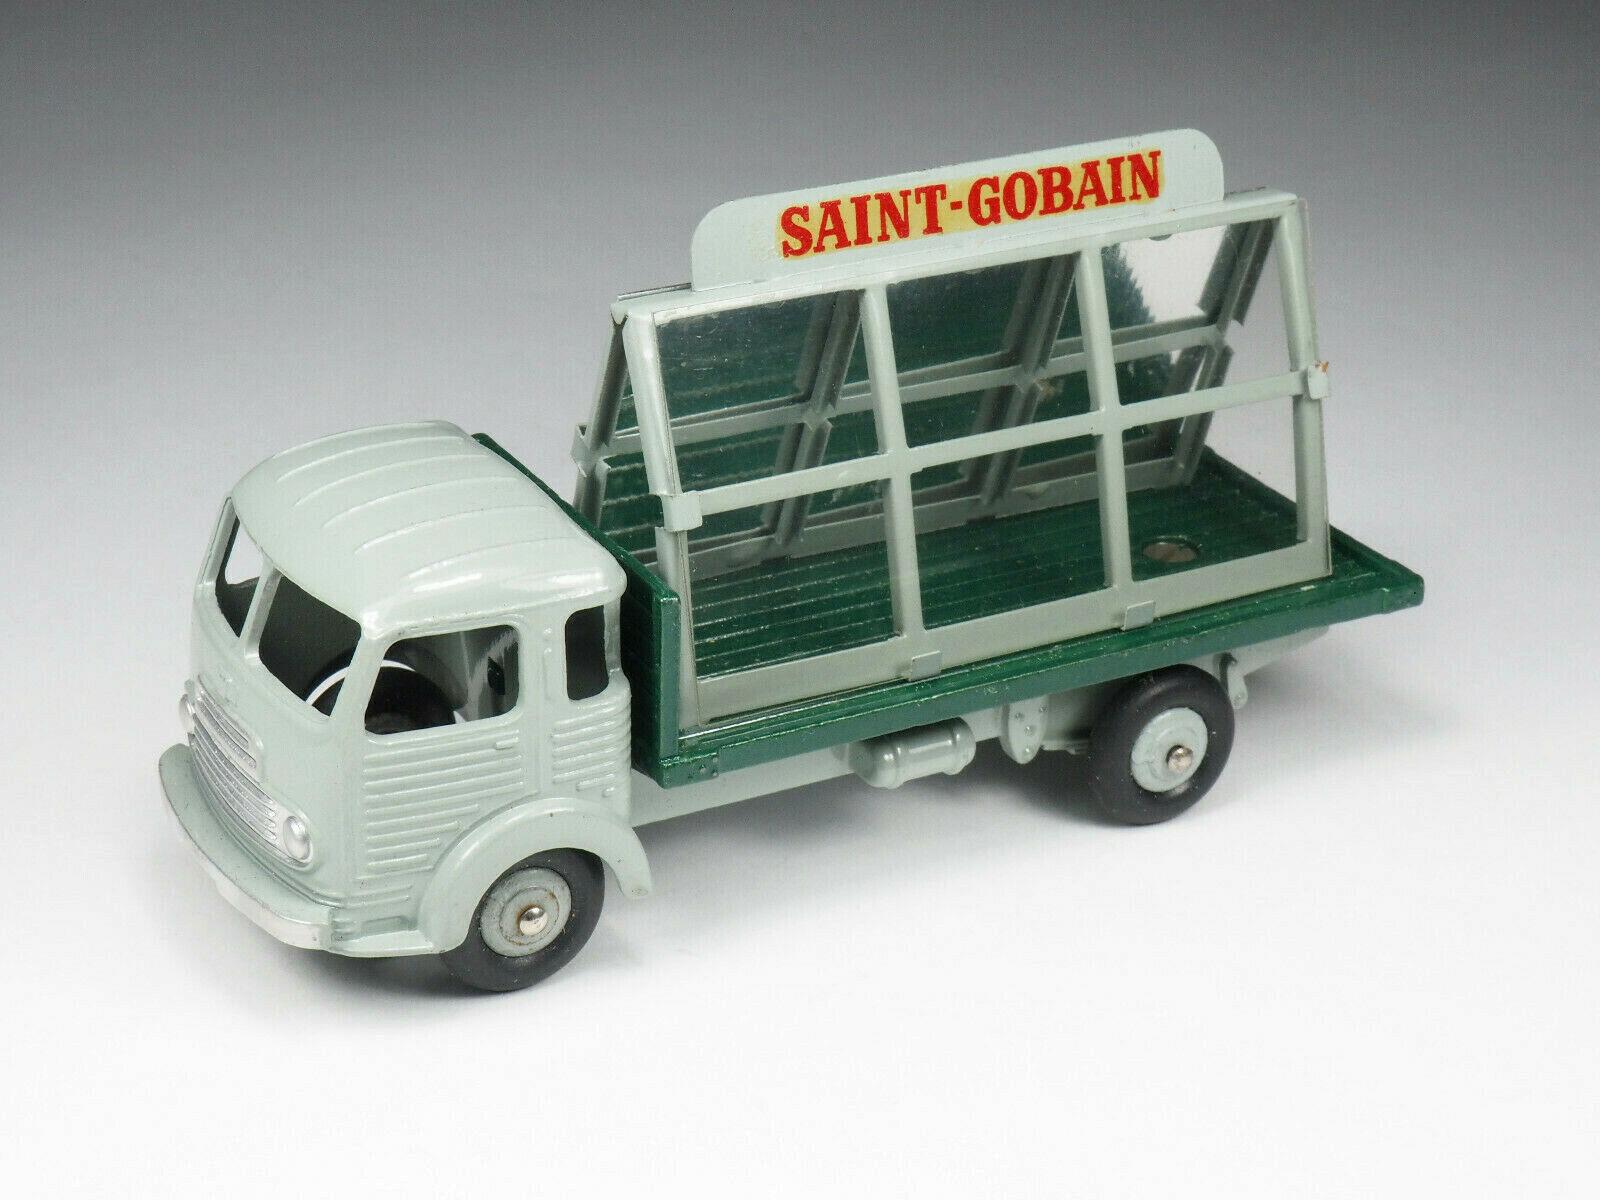 Dinky giocattoli  33C  Miroitier Simca autogo  143e  France